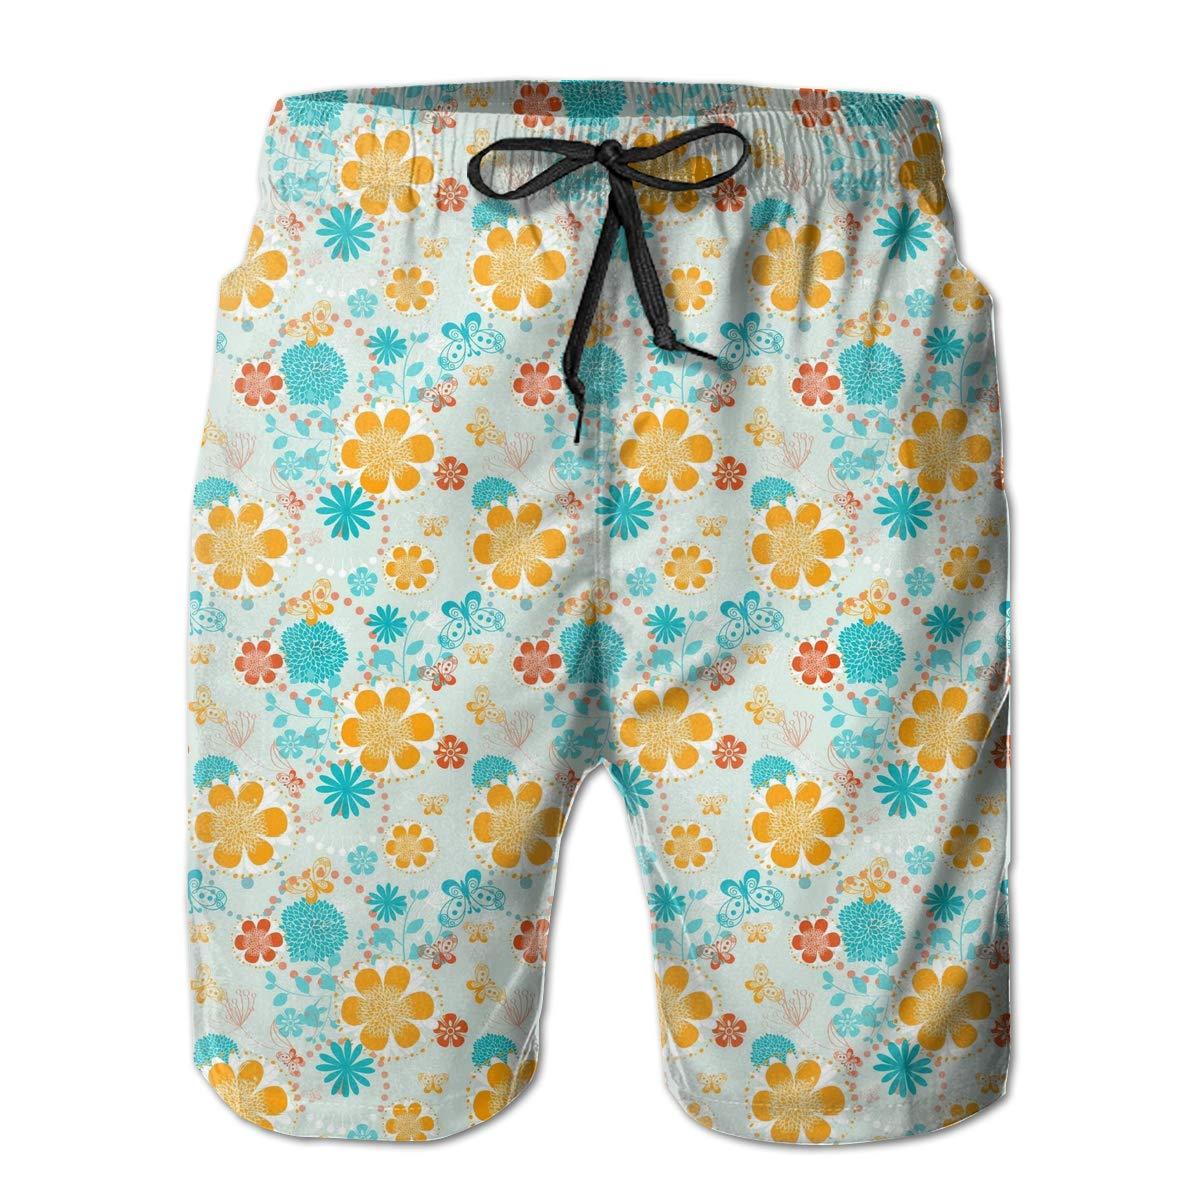 Leisue Orange Flower Quick Dry Elastic Lace Boardshorts Beach Shorts Pants Swim Trunks Male Swimsuit with Pockets